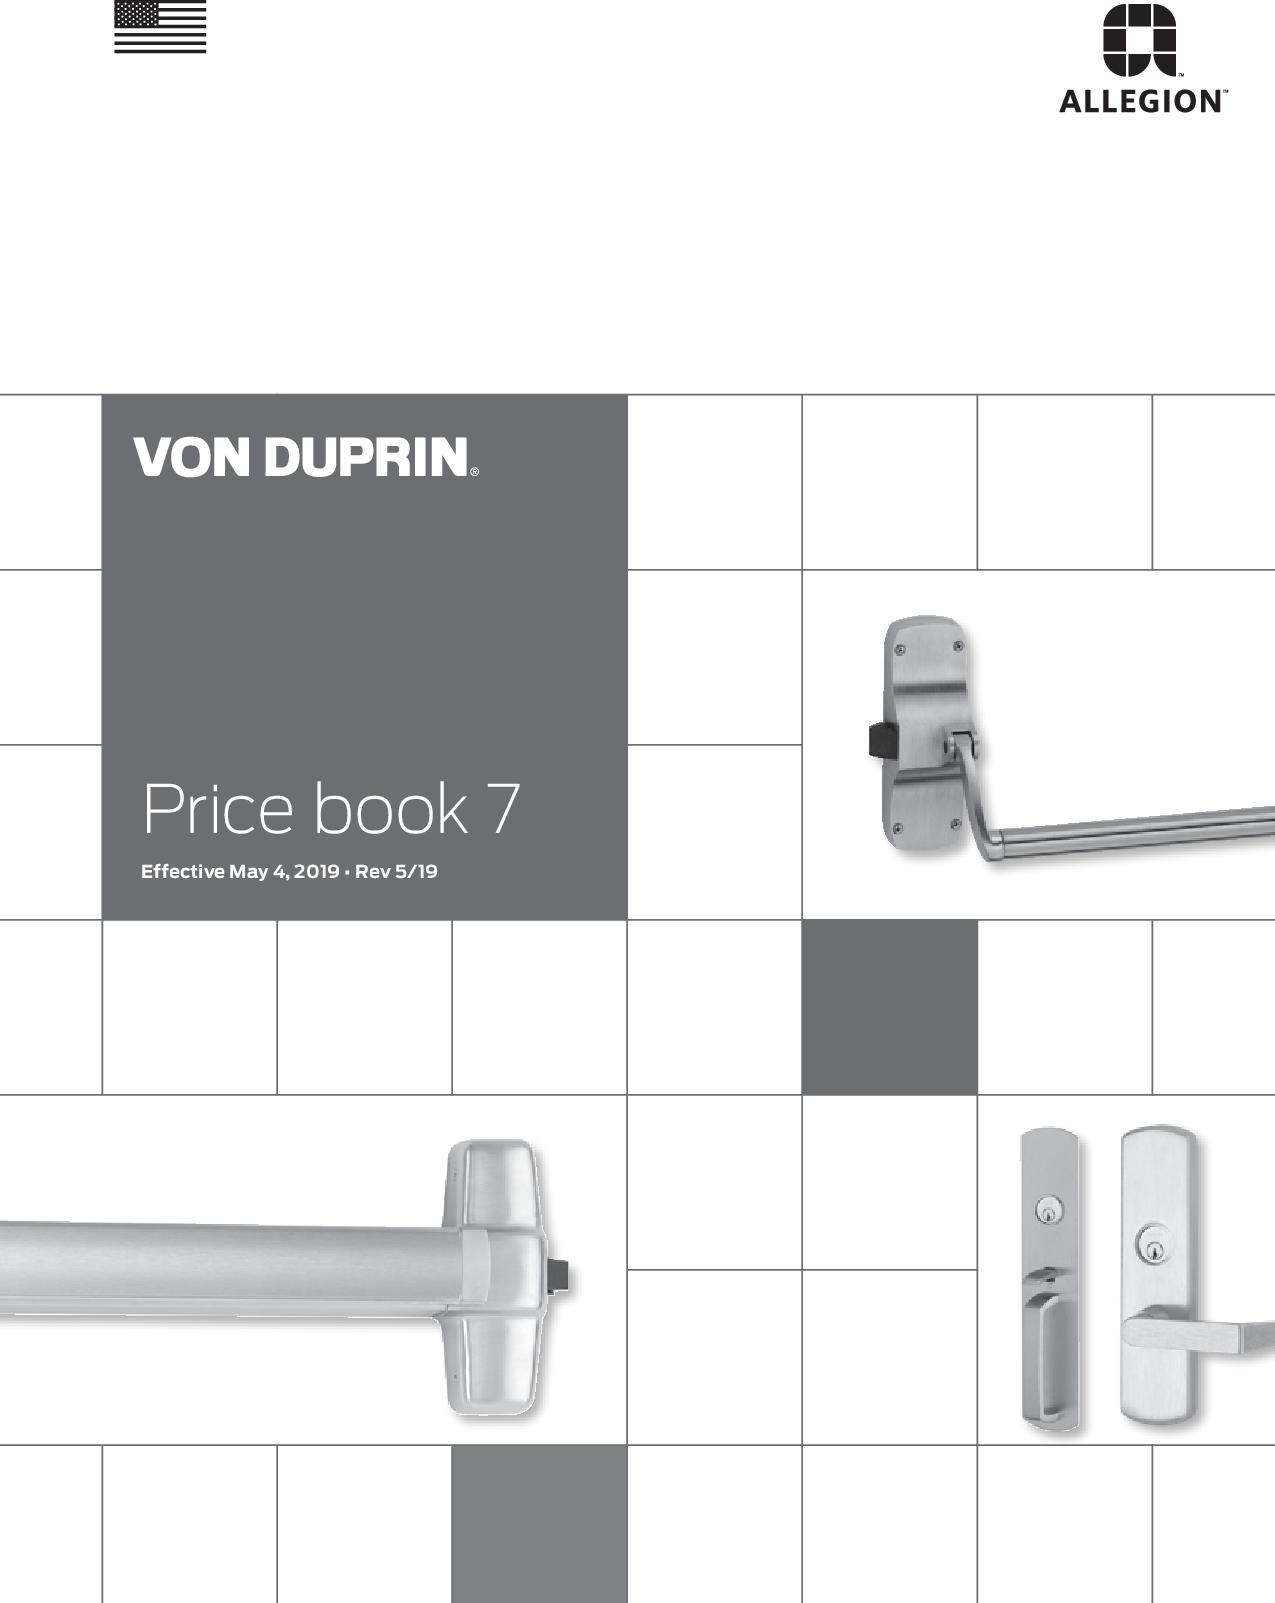 Von Duprin 2019 Price Book (as Of 5/4/19) PB7 on